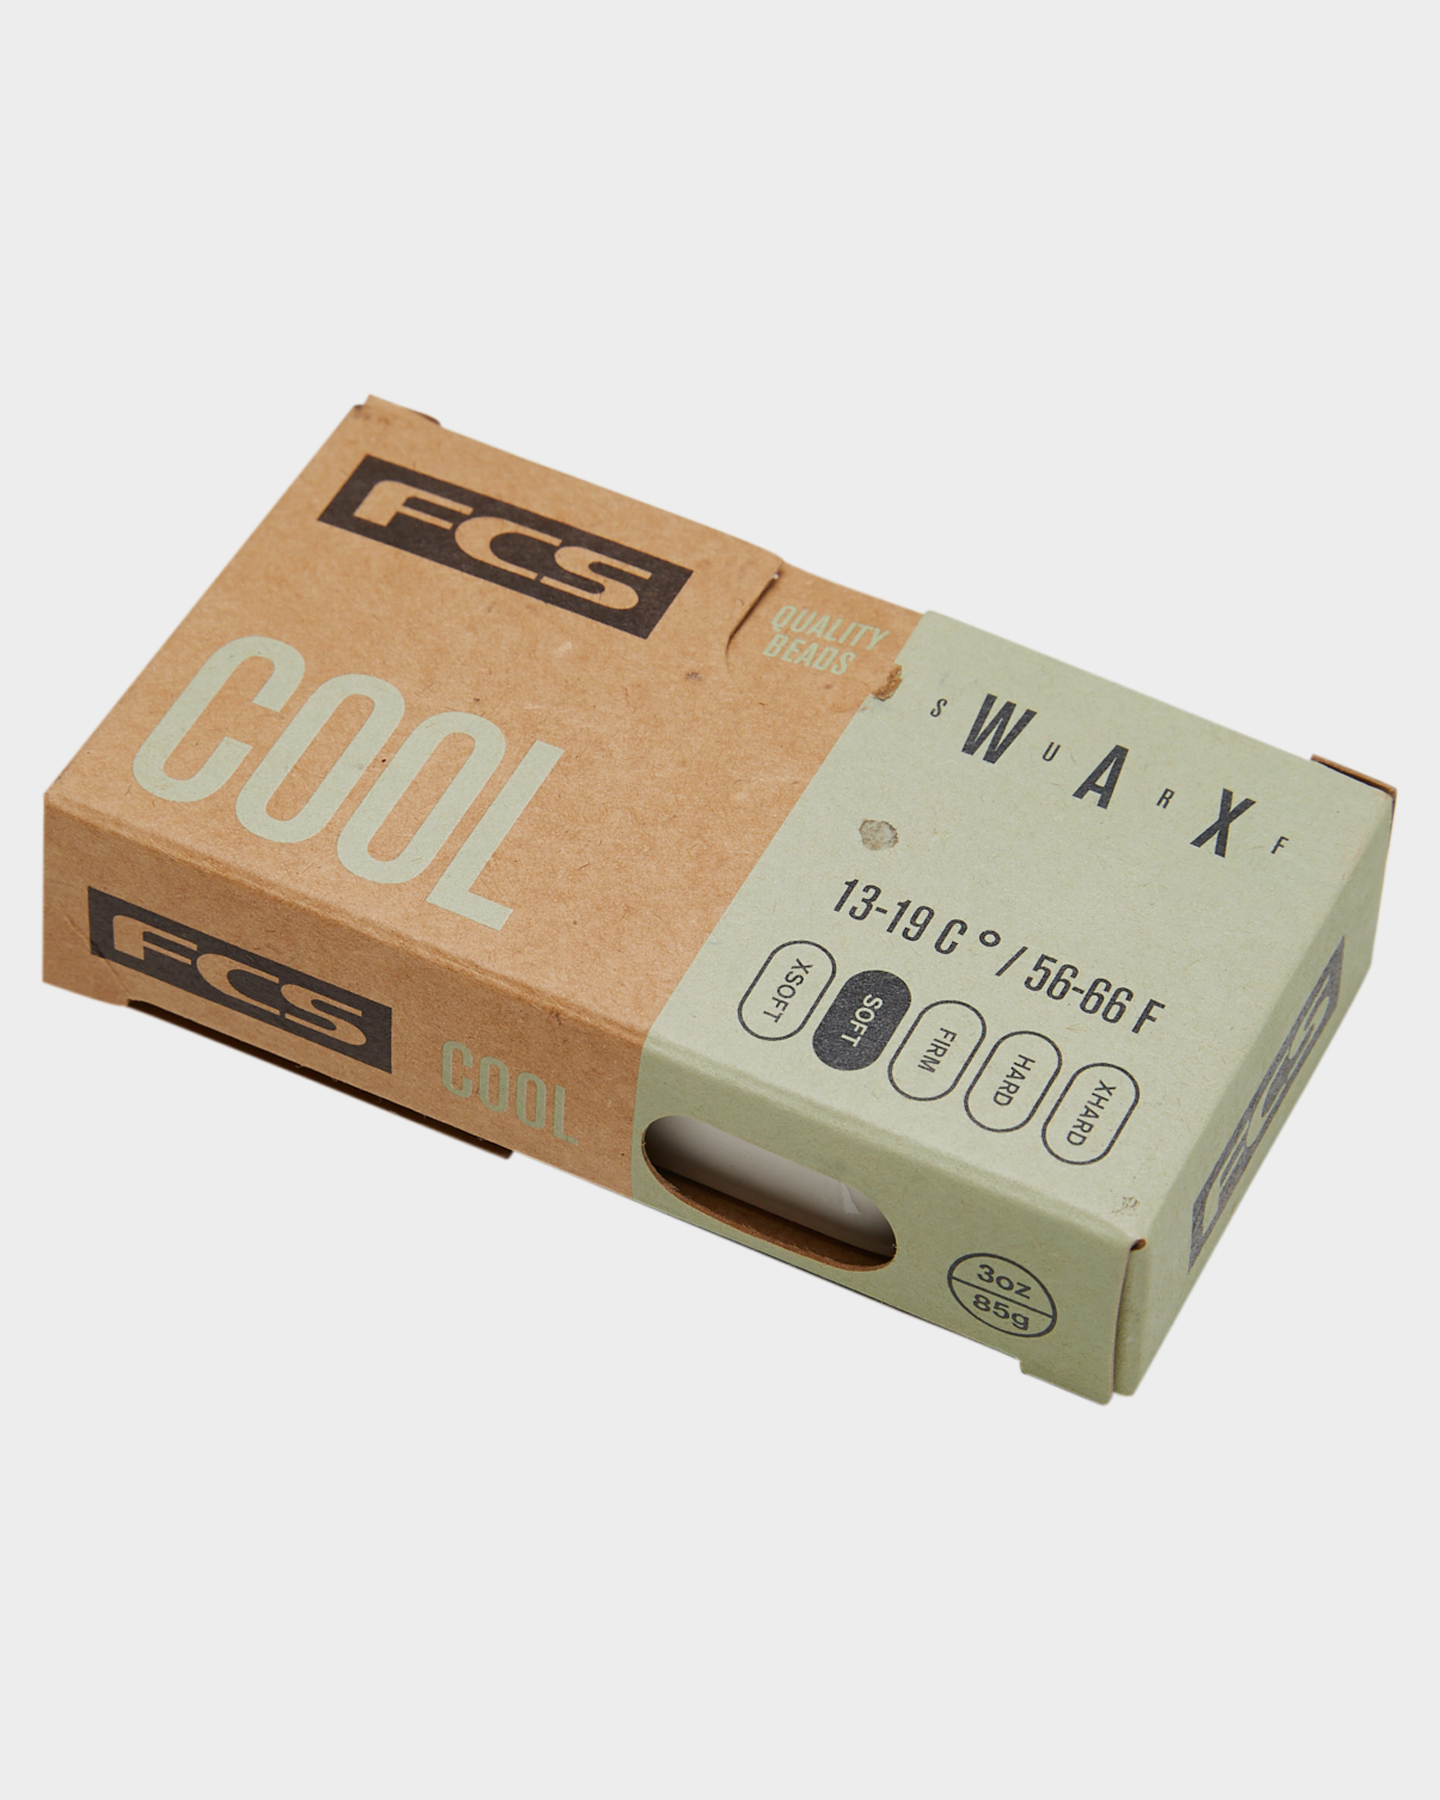 Fcs Cool Surf Wax